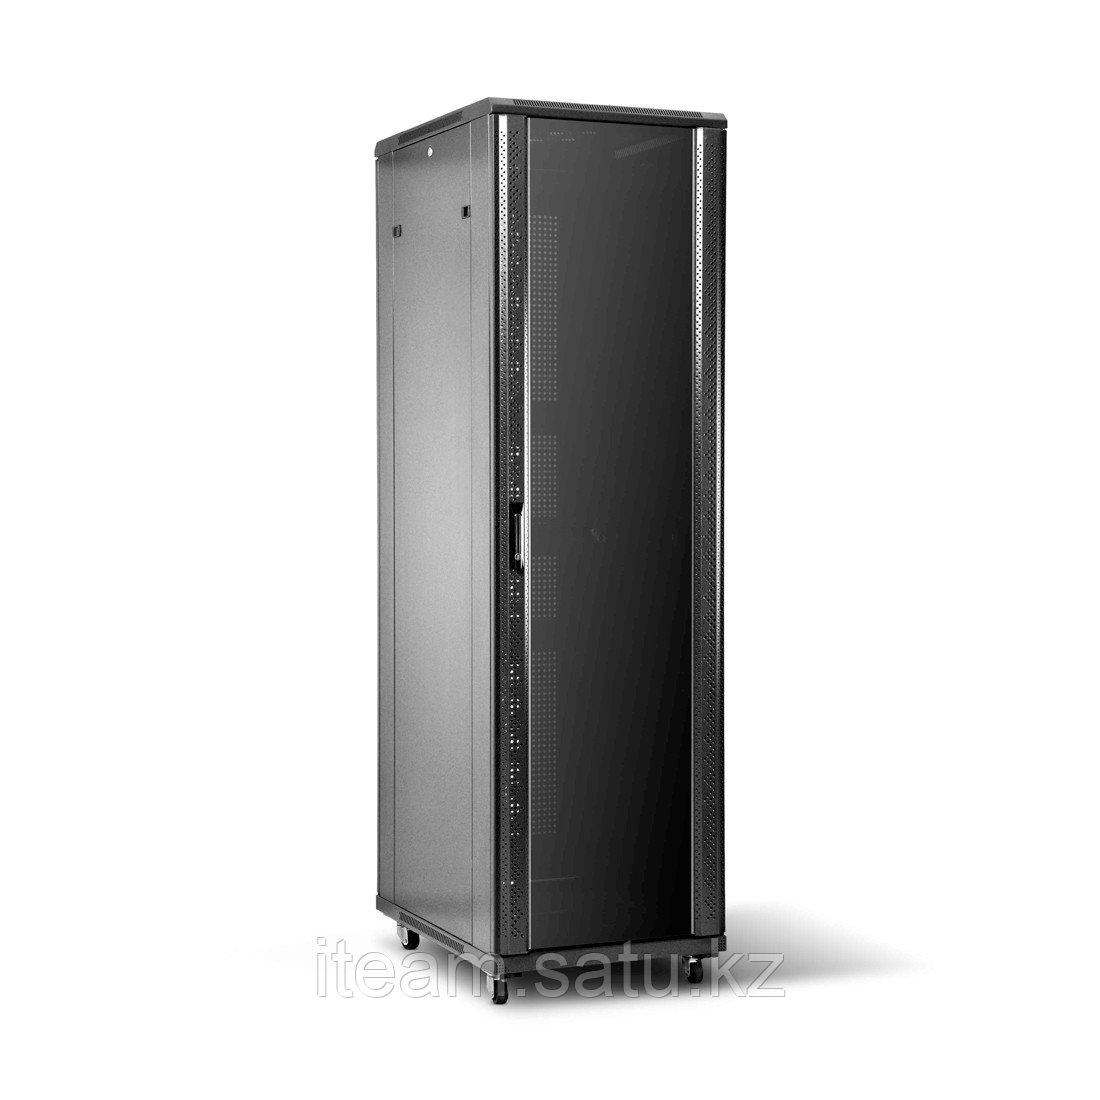 Шкаф серверный SHIP 601S.6847.24.100 47U, 600*800*2200 мм